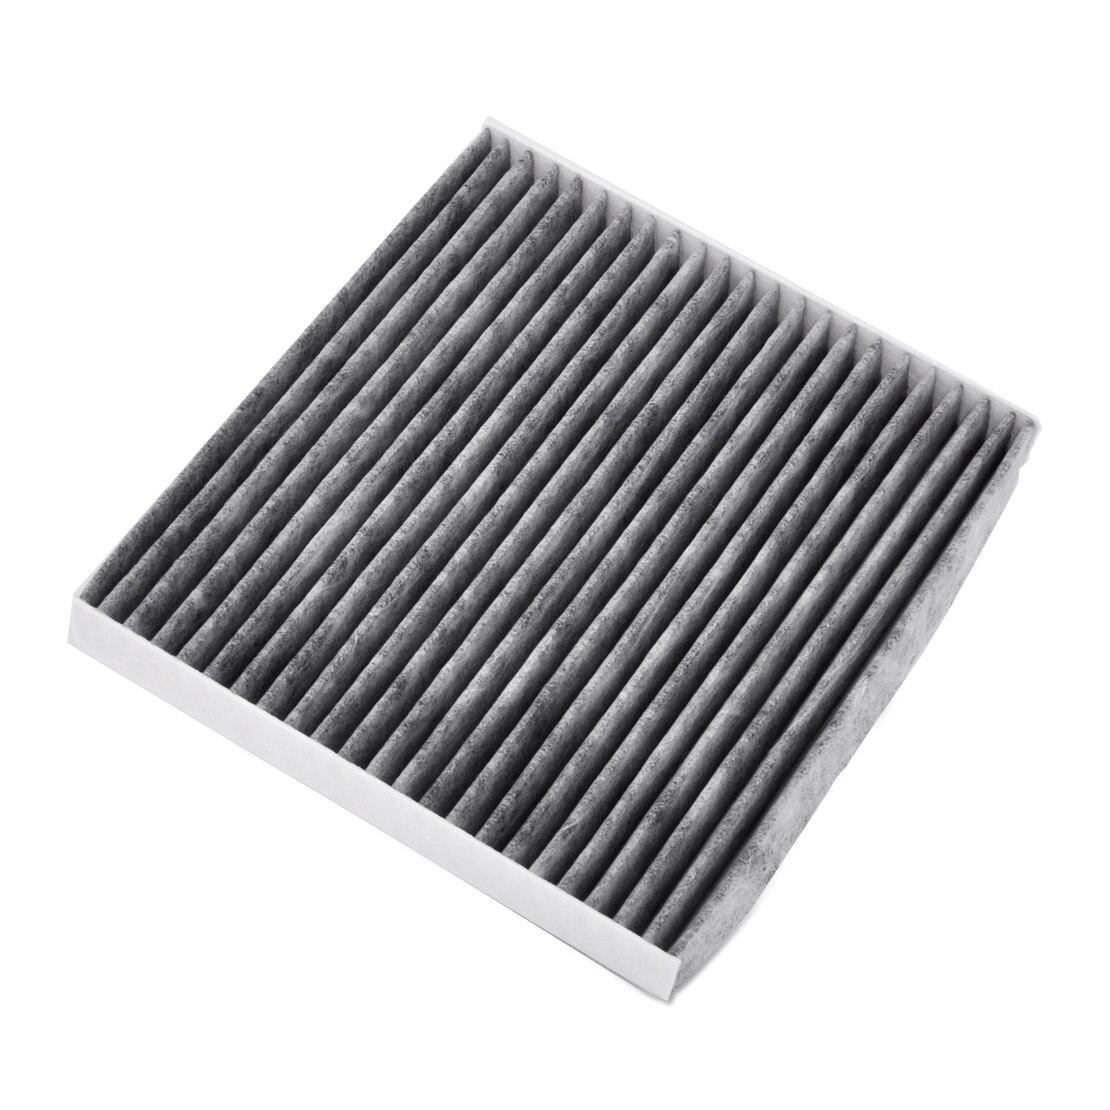 Dwcx car carbon fiber cabin air filter 6 gj6b 61 p11 gj6a 61